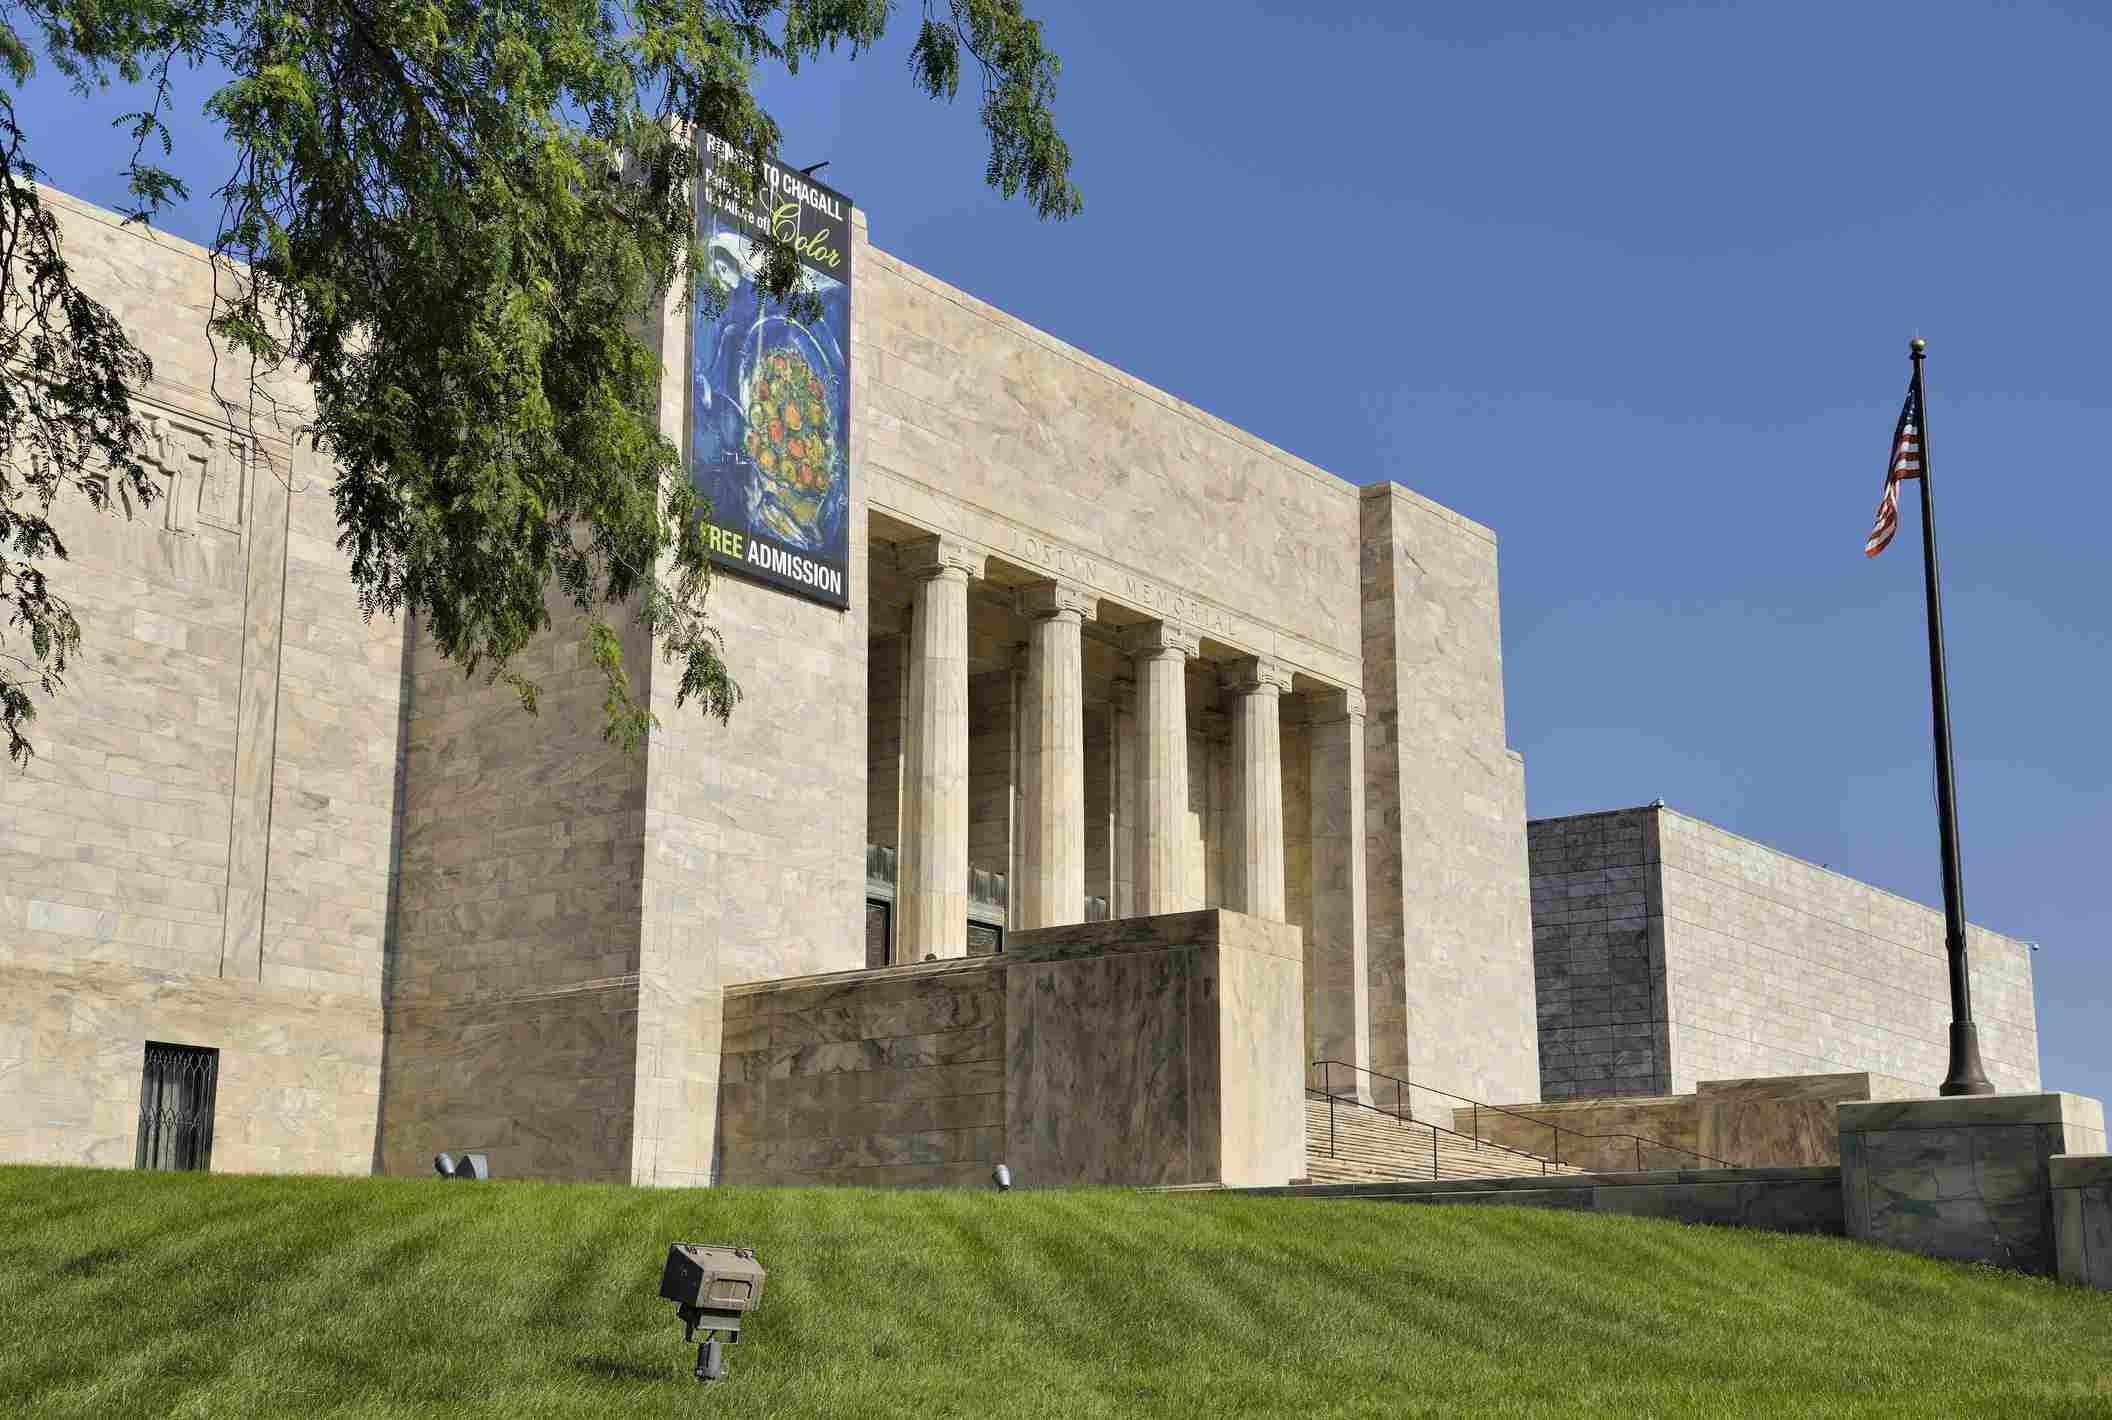 Joslyn Art Museum, Omaha